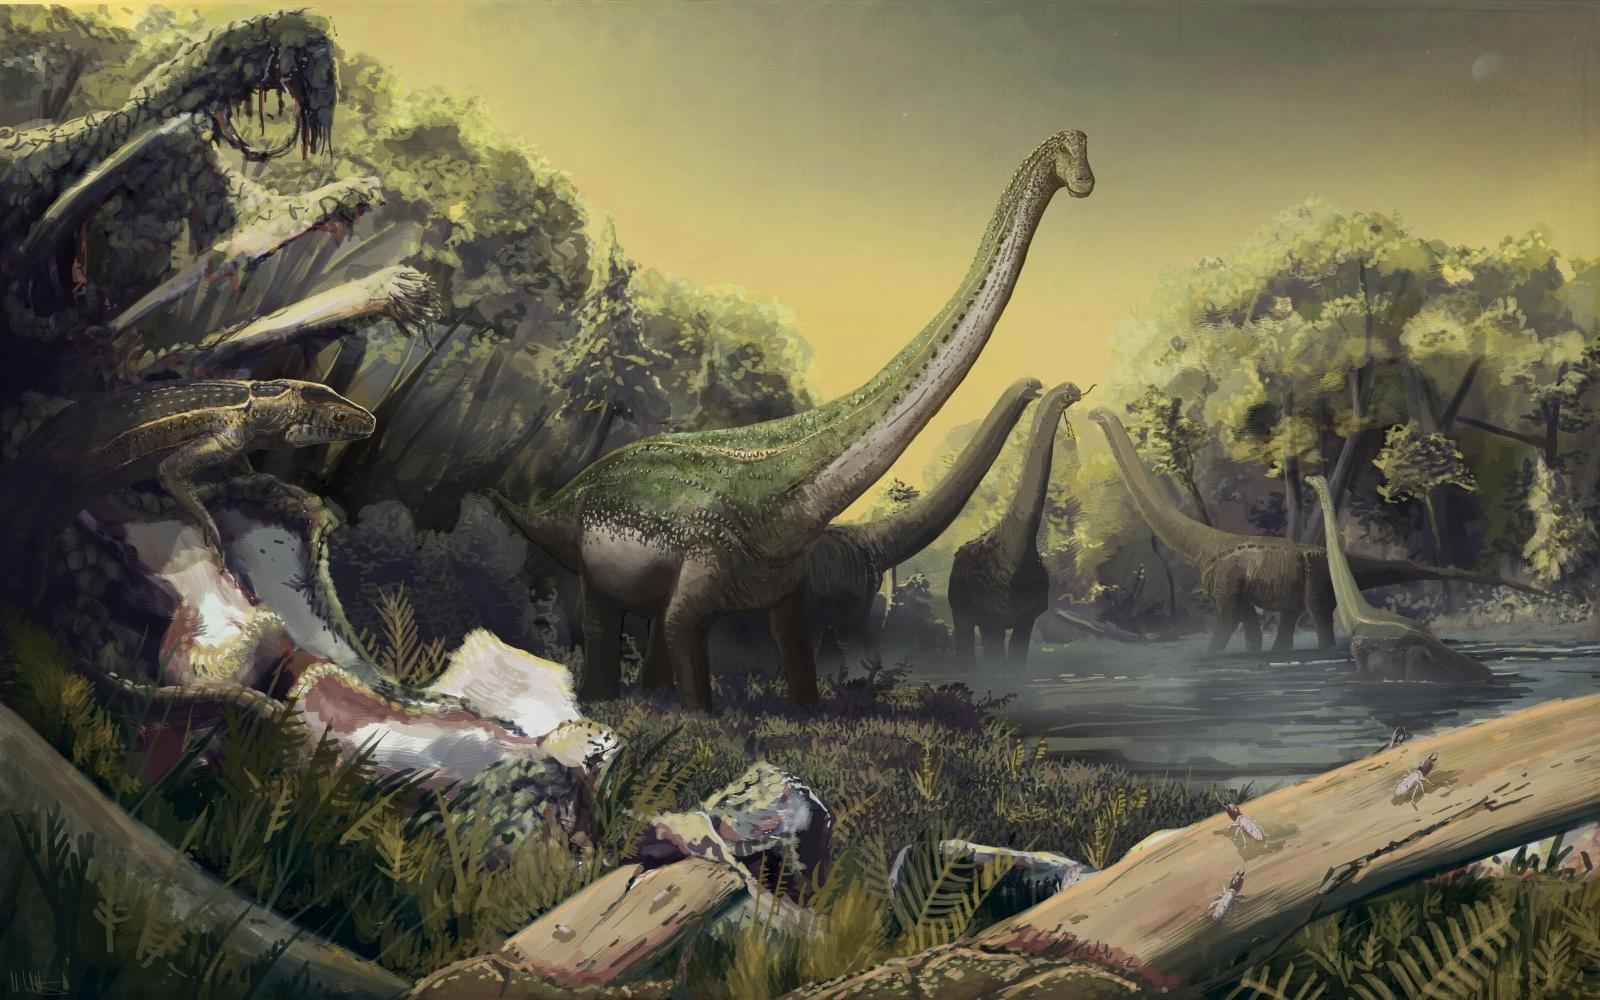 Shingopana songwensis dinosaur